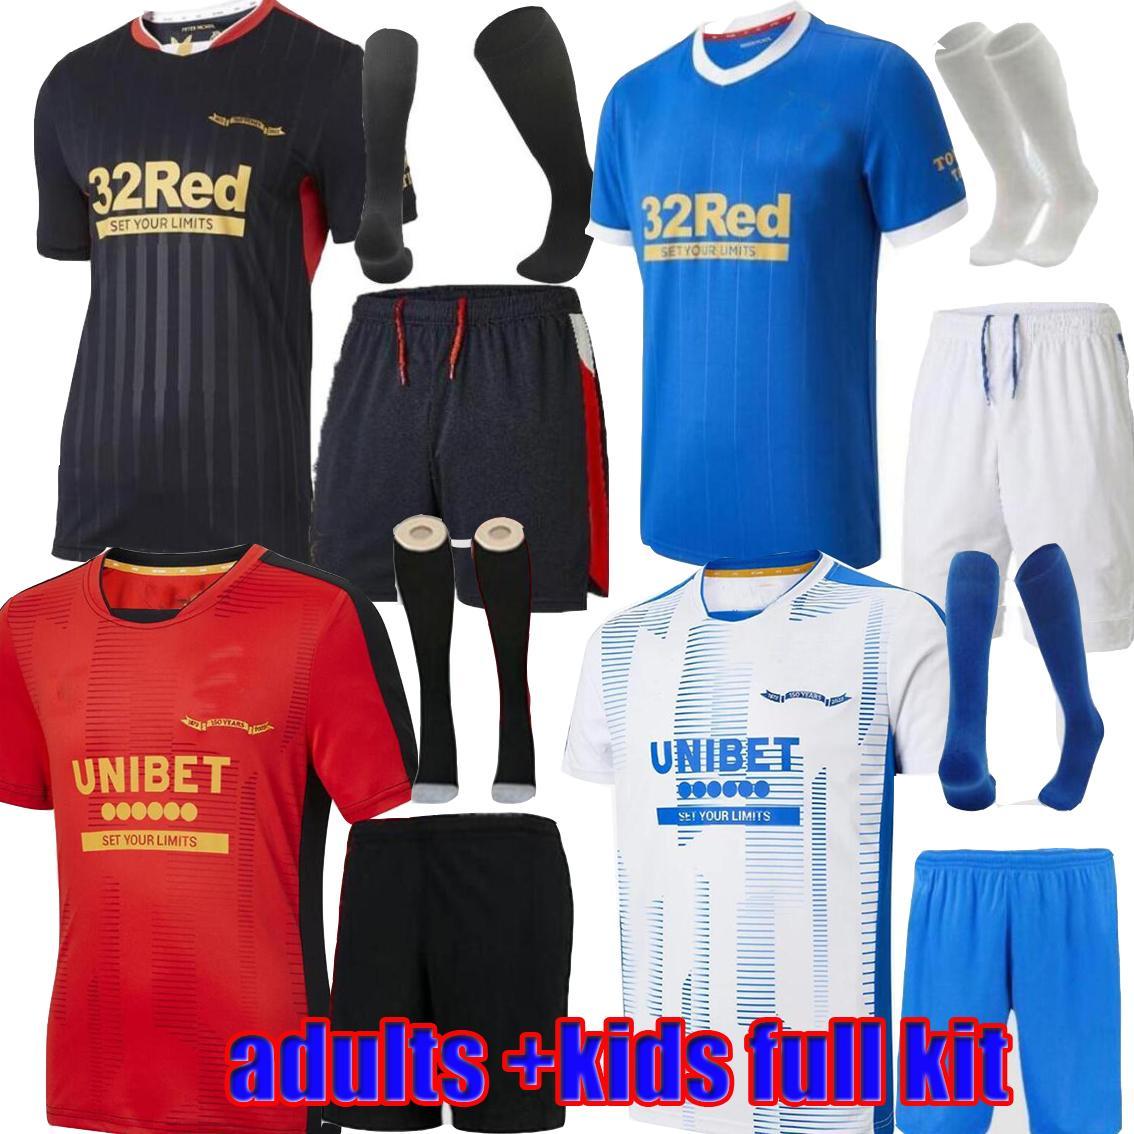 Rangers 21 22 Jerseys de football 150e Anniversaire Domicile Troisième Glasgow Formation Defoe Hagi Barker Morelos Tavernier 2021 2022 Adultes + Kit Kit Kit Maillot Football Shirt